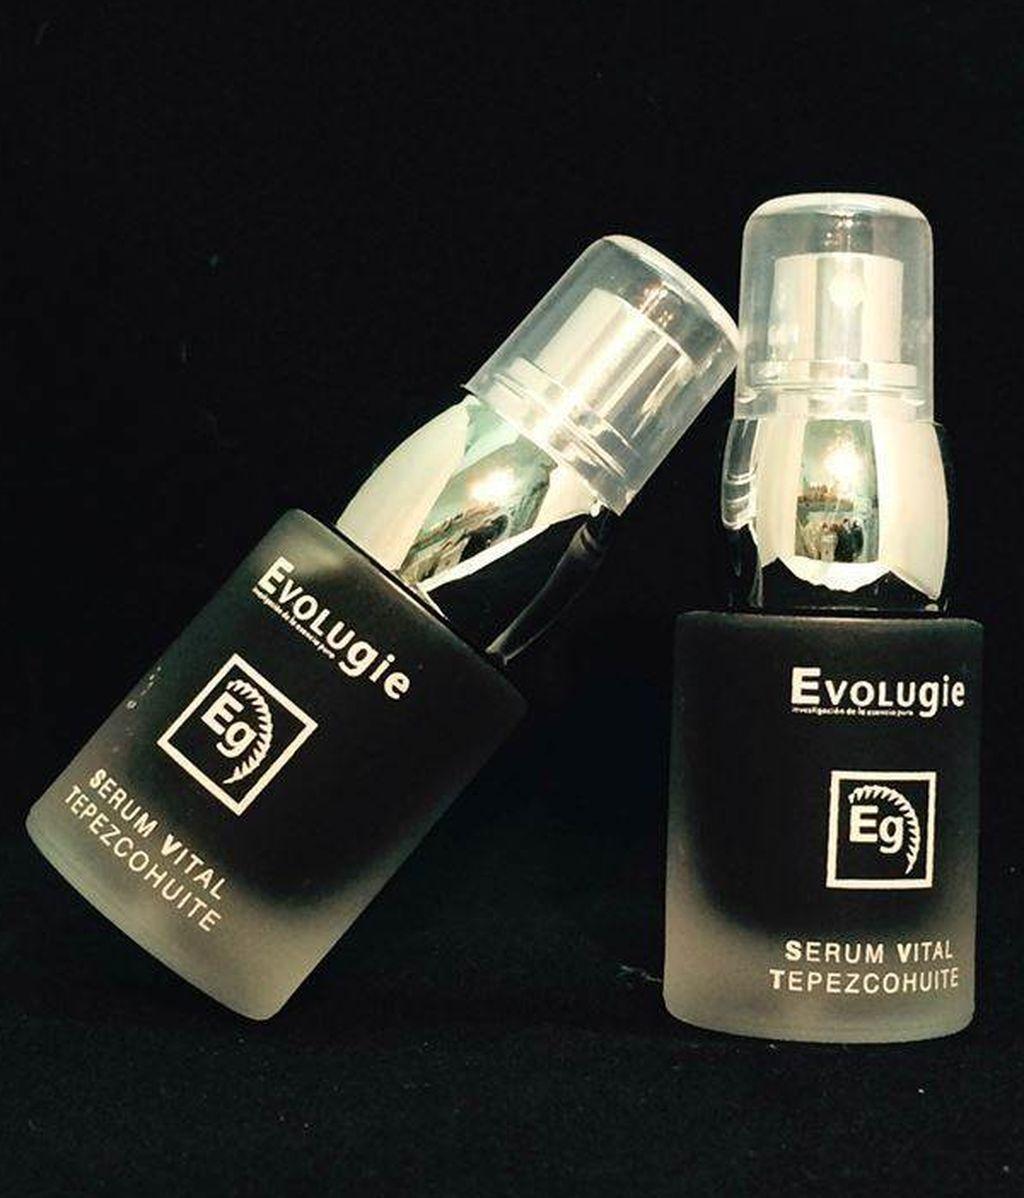 evolugie-serum-vital-tepezcohuite-15ml_pic33860ni0t0